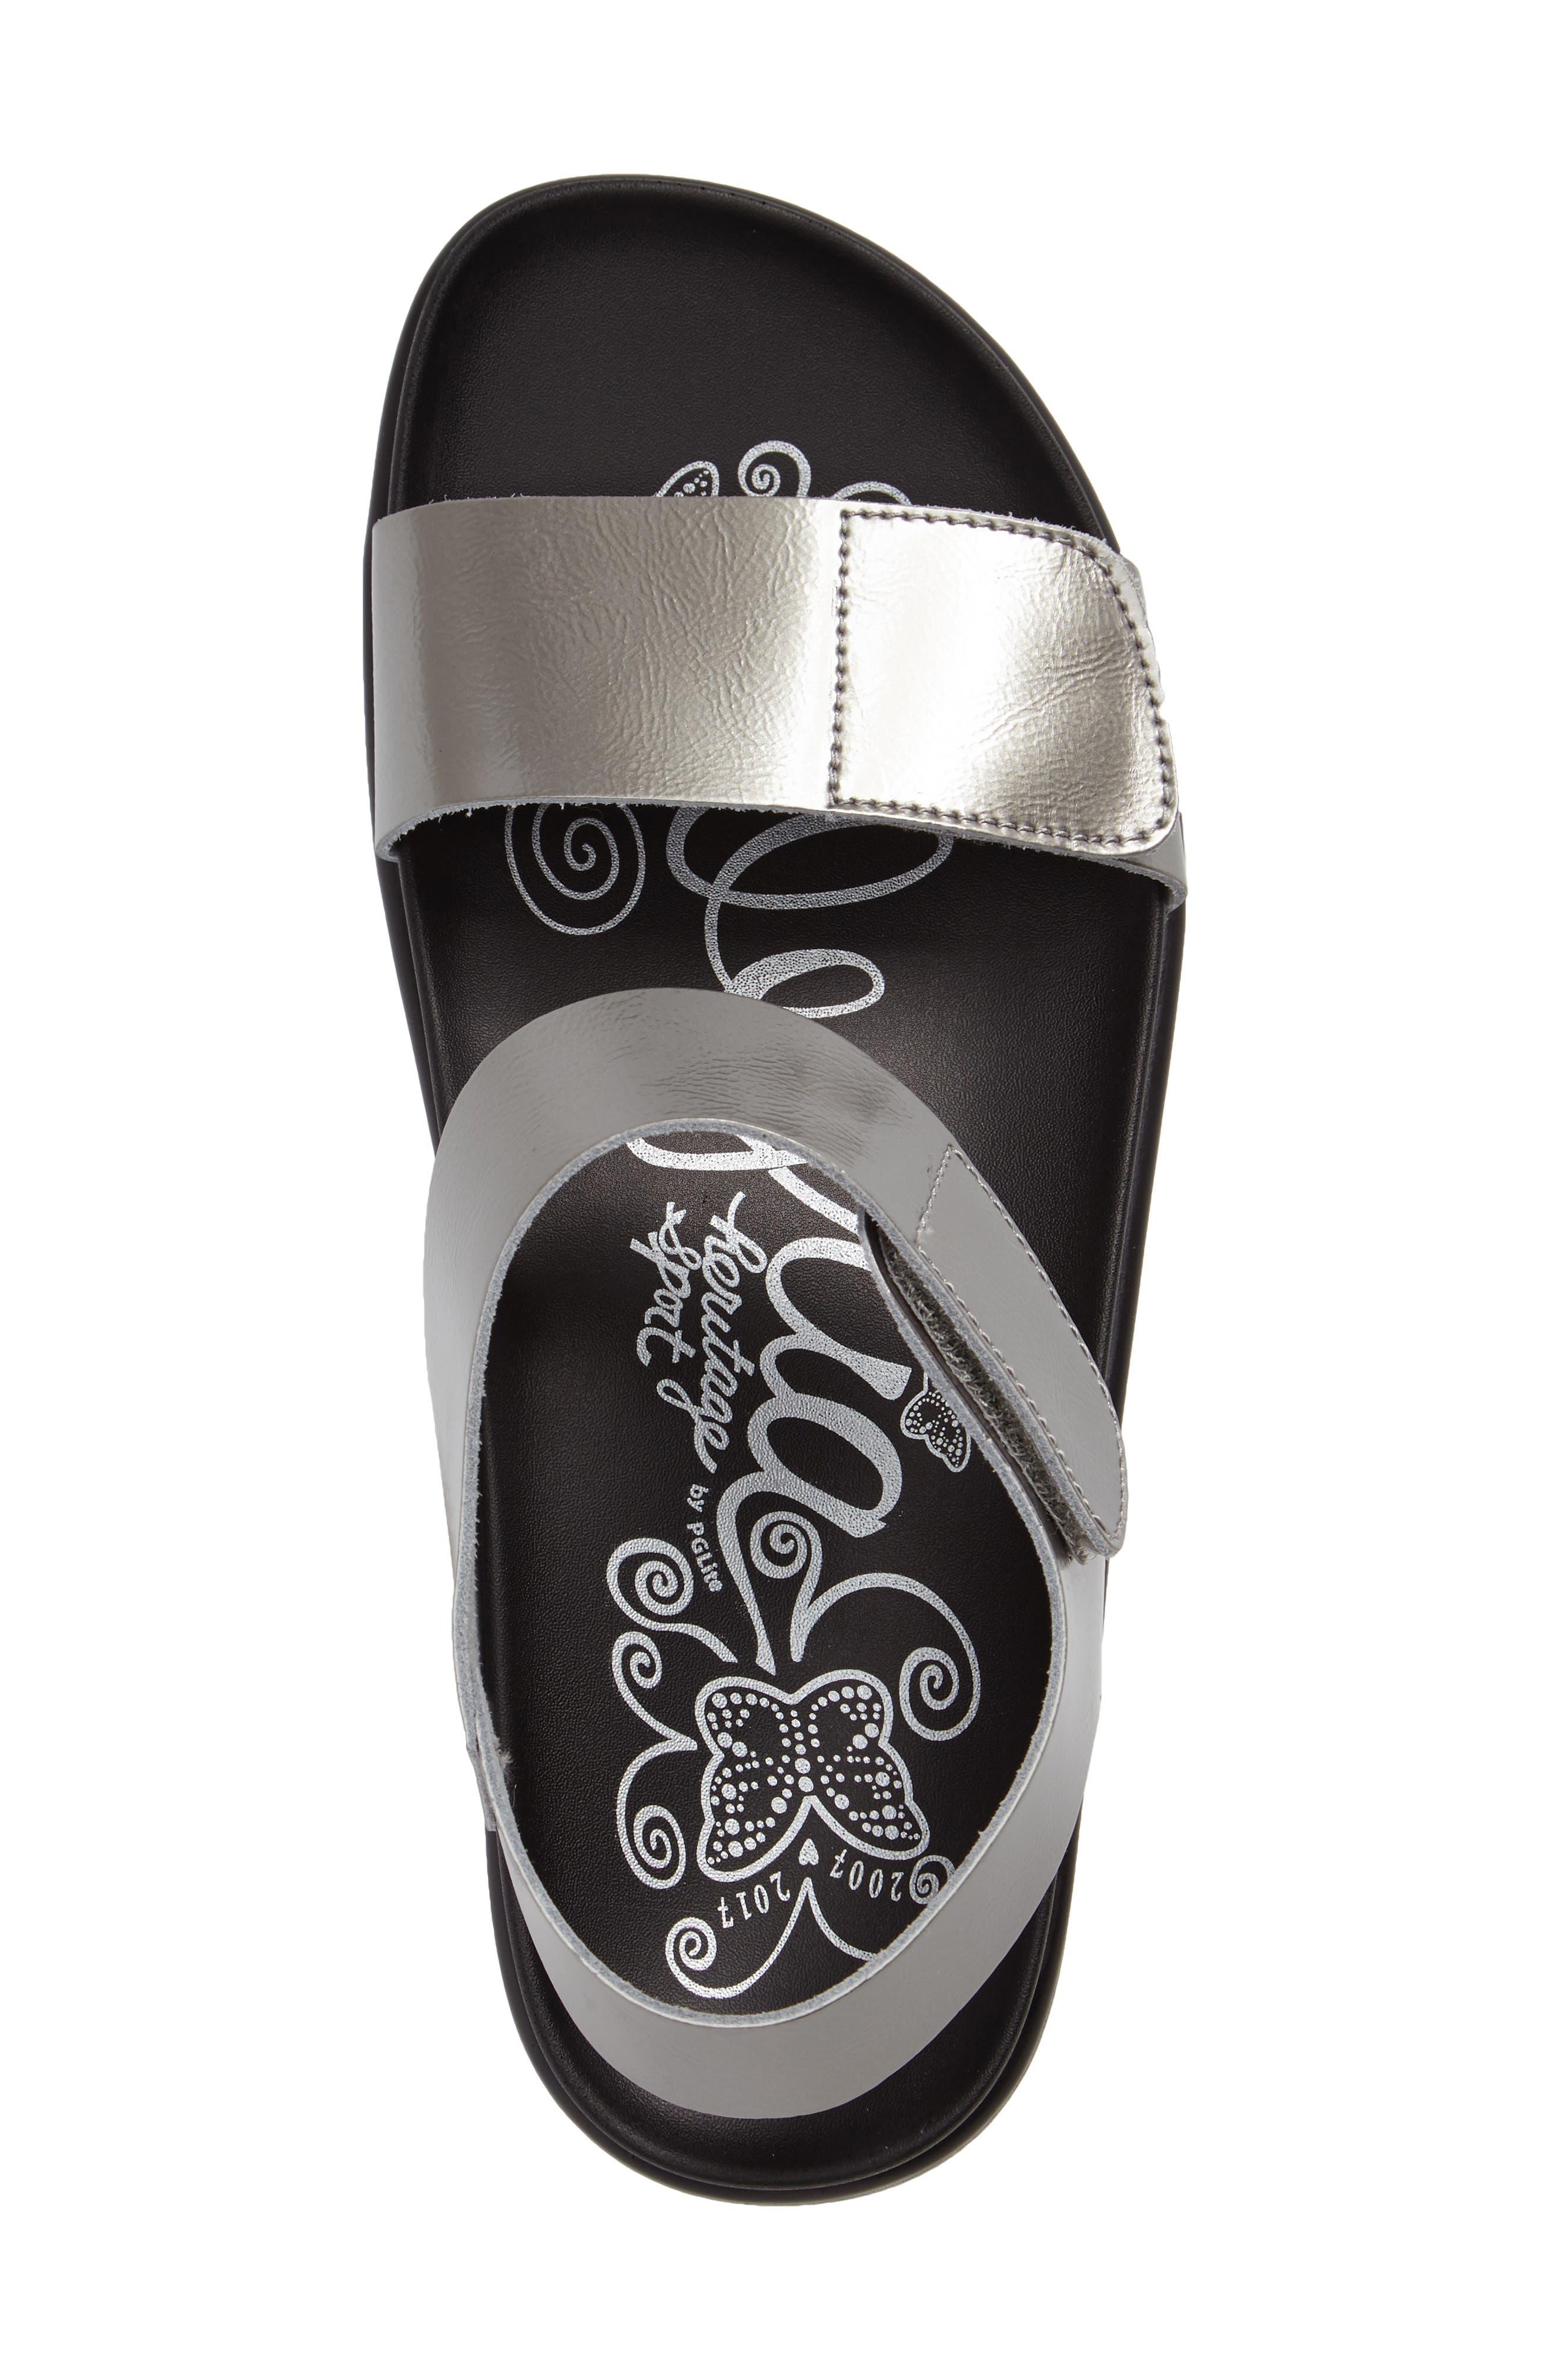 Playa Sandal,                             Alternate thumbnail 3, color,                             Pewter Patent Leather